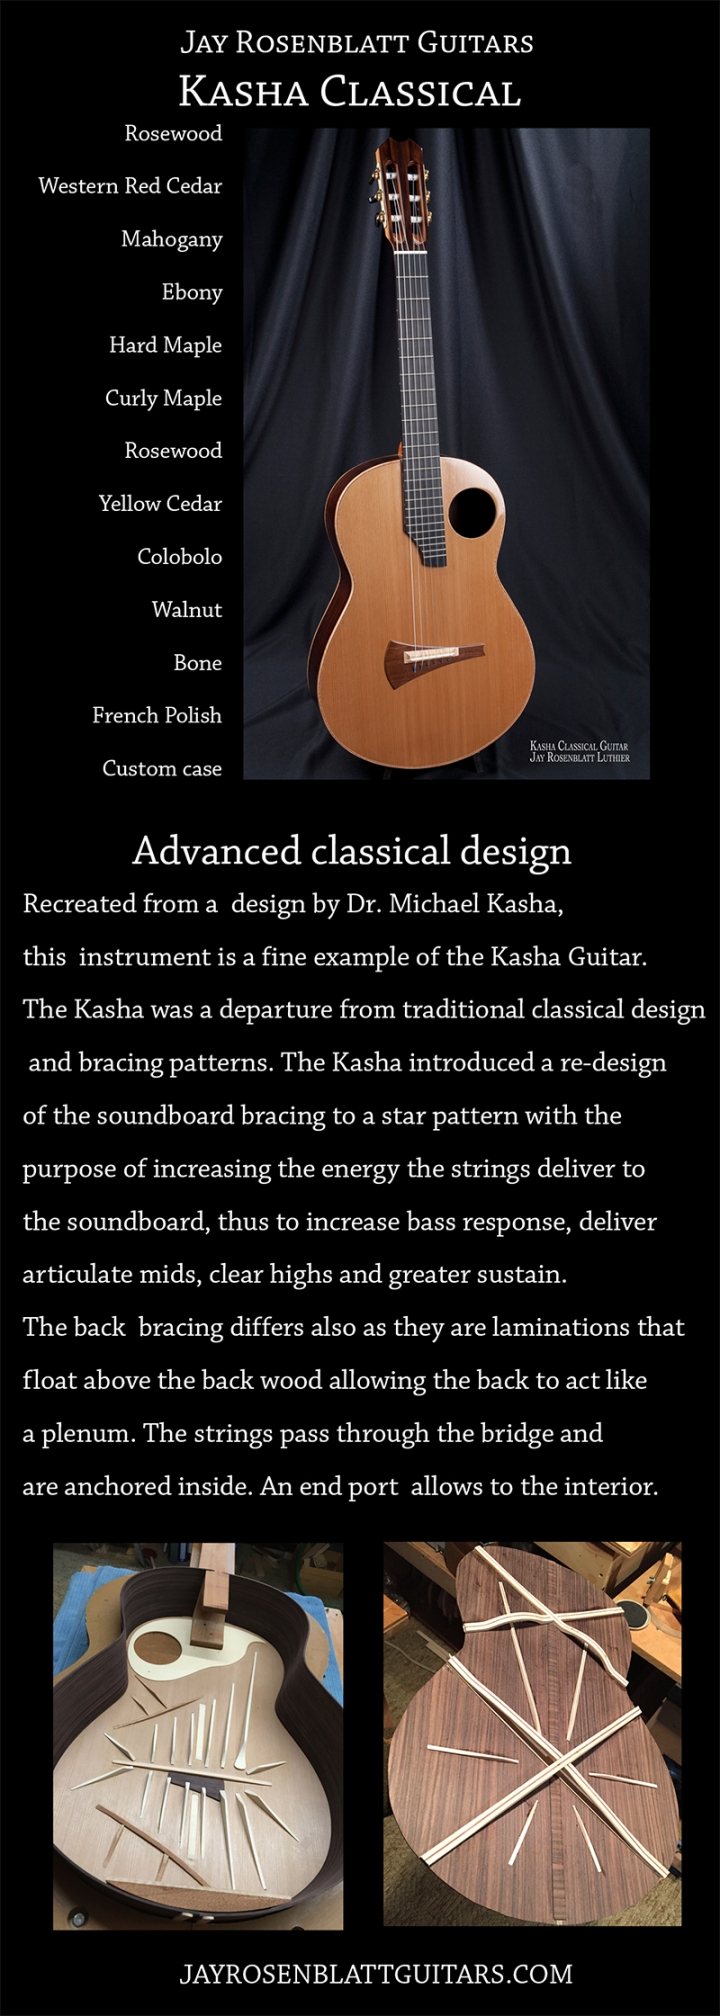 Kasha Classical built by Jay Rosenblatt